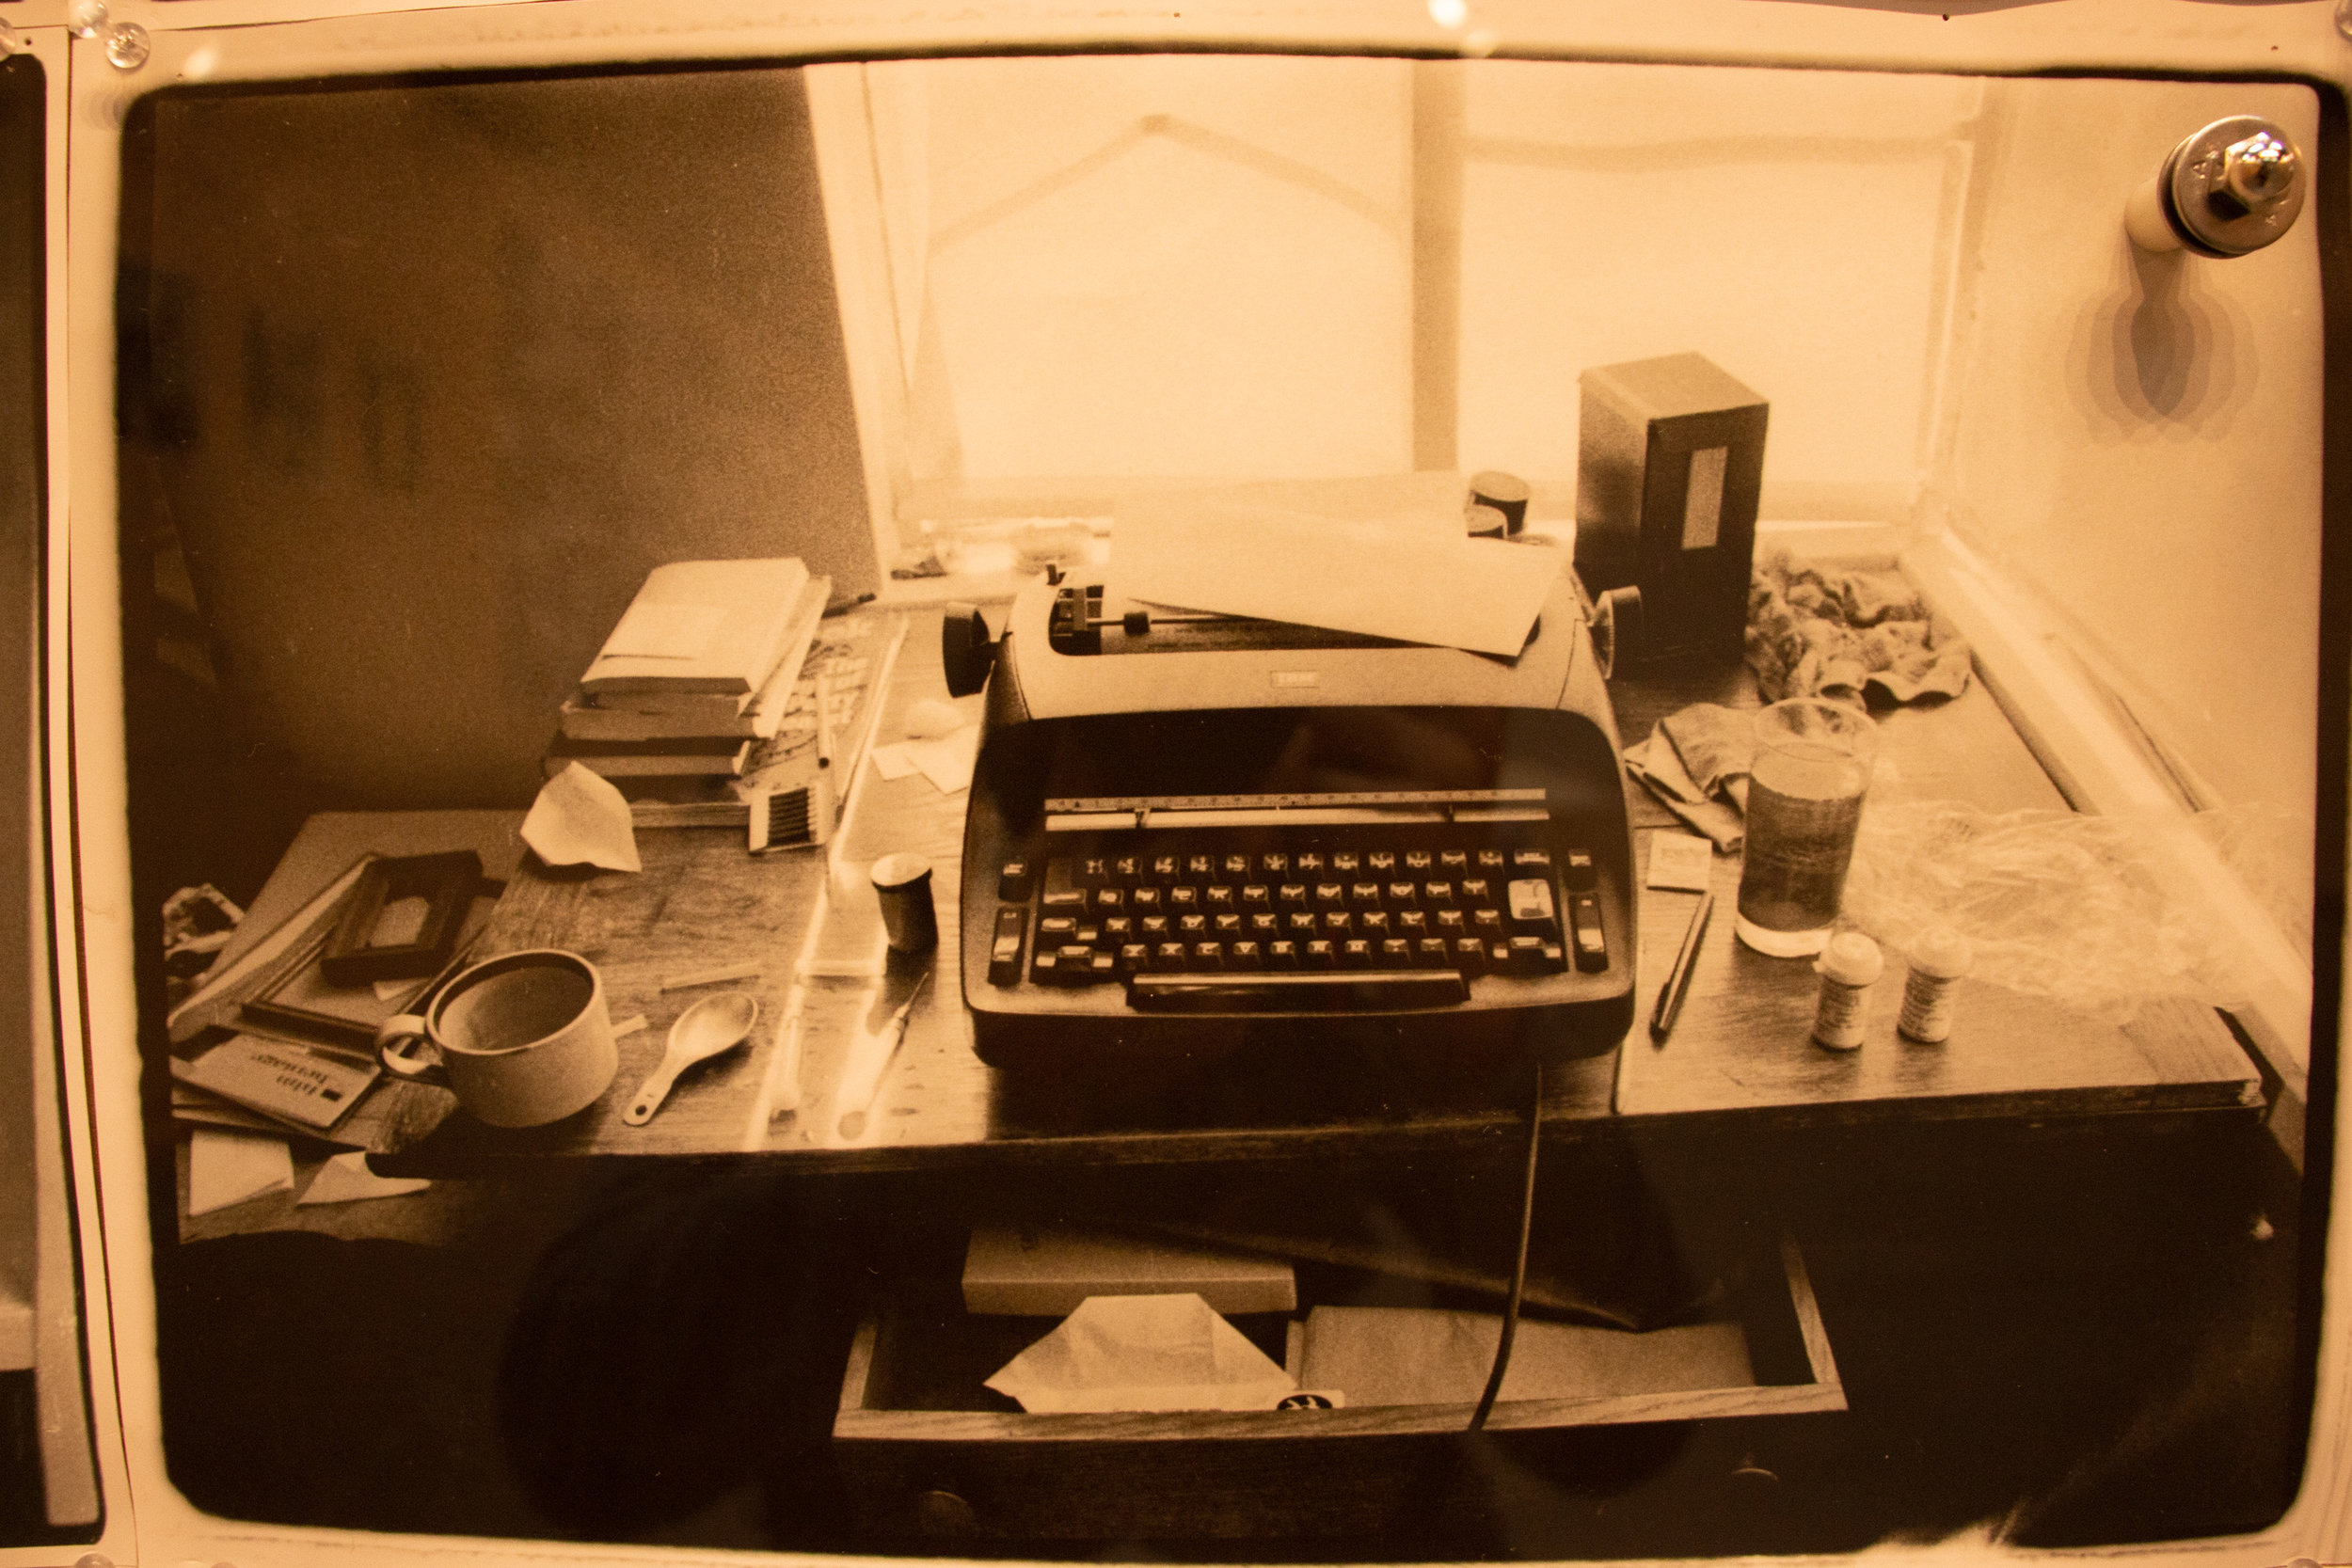 Desk & typewriter of William S. Burroughs, photographed by Annie Liebovitz. Shayn Almeida / The Corsair